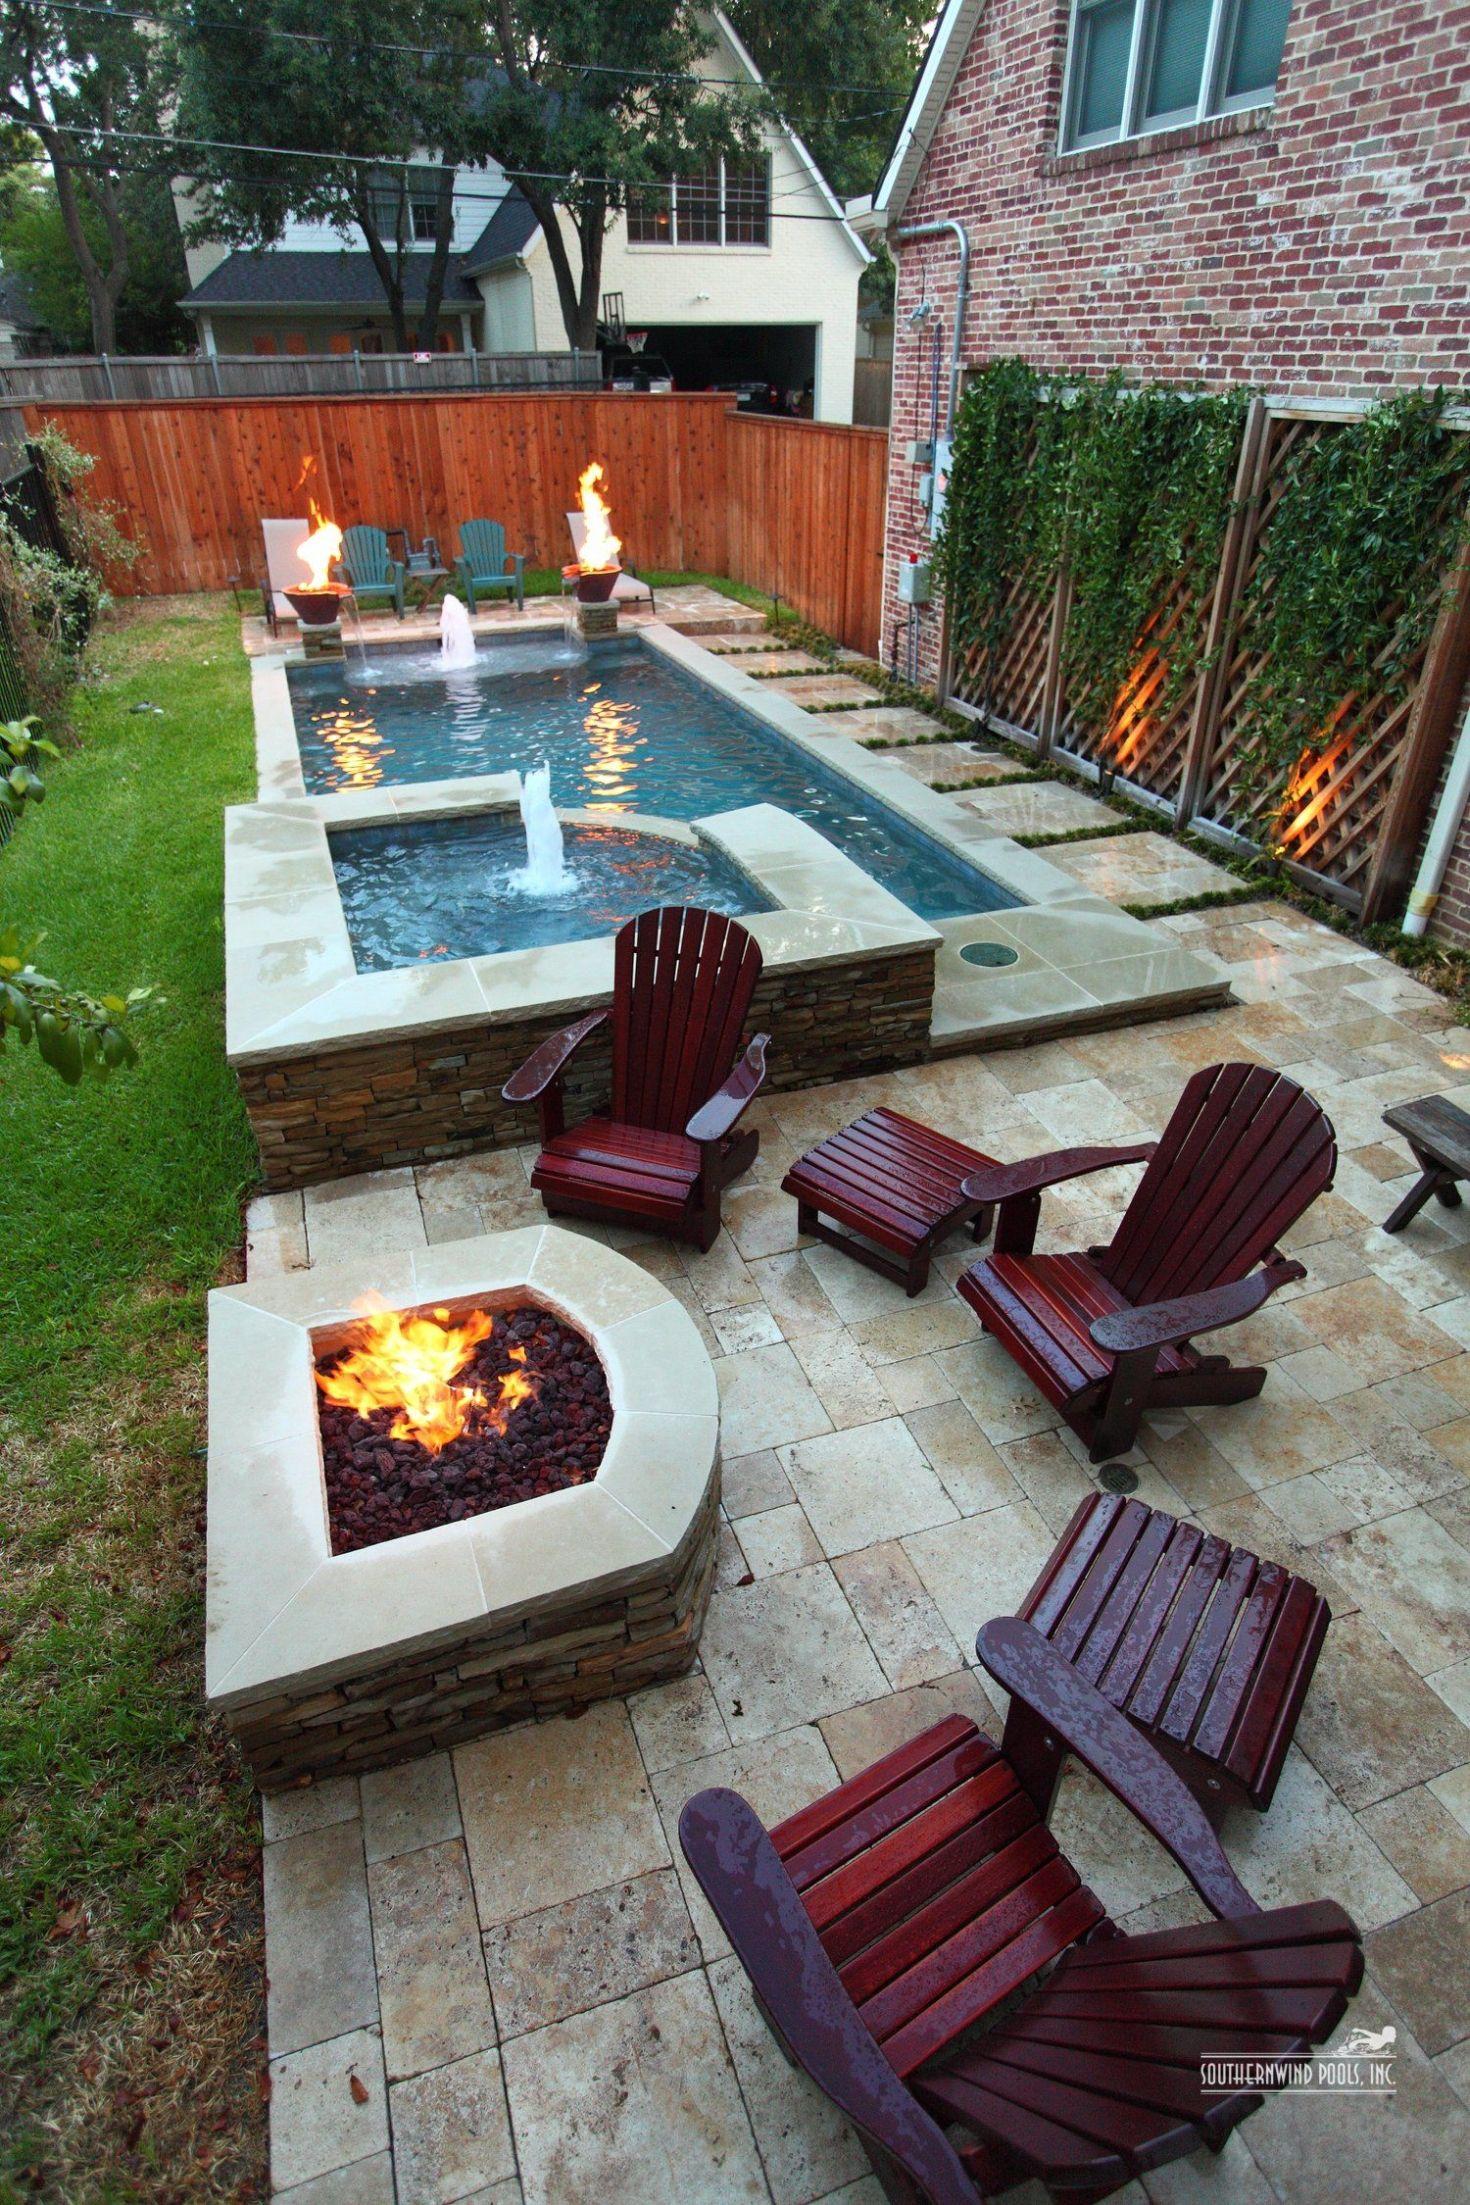 Small Patio Jacuzzi Narrow Backyard Ideas Small Backyard Pools Swimming Pools Backyard Modern backyard ideas with hot tub